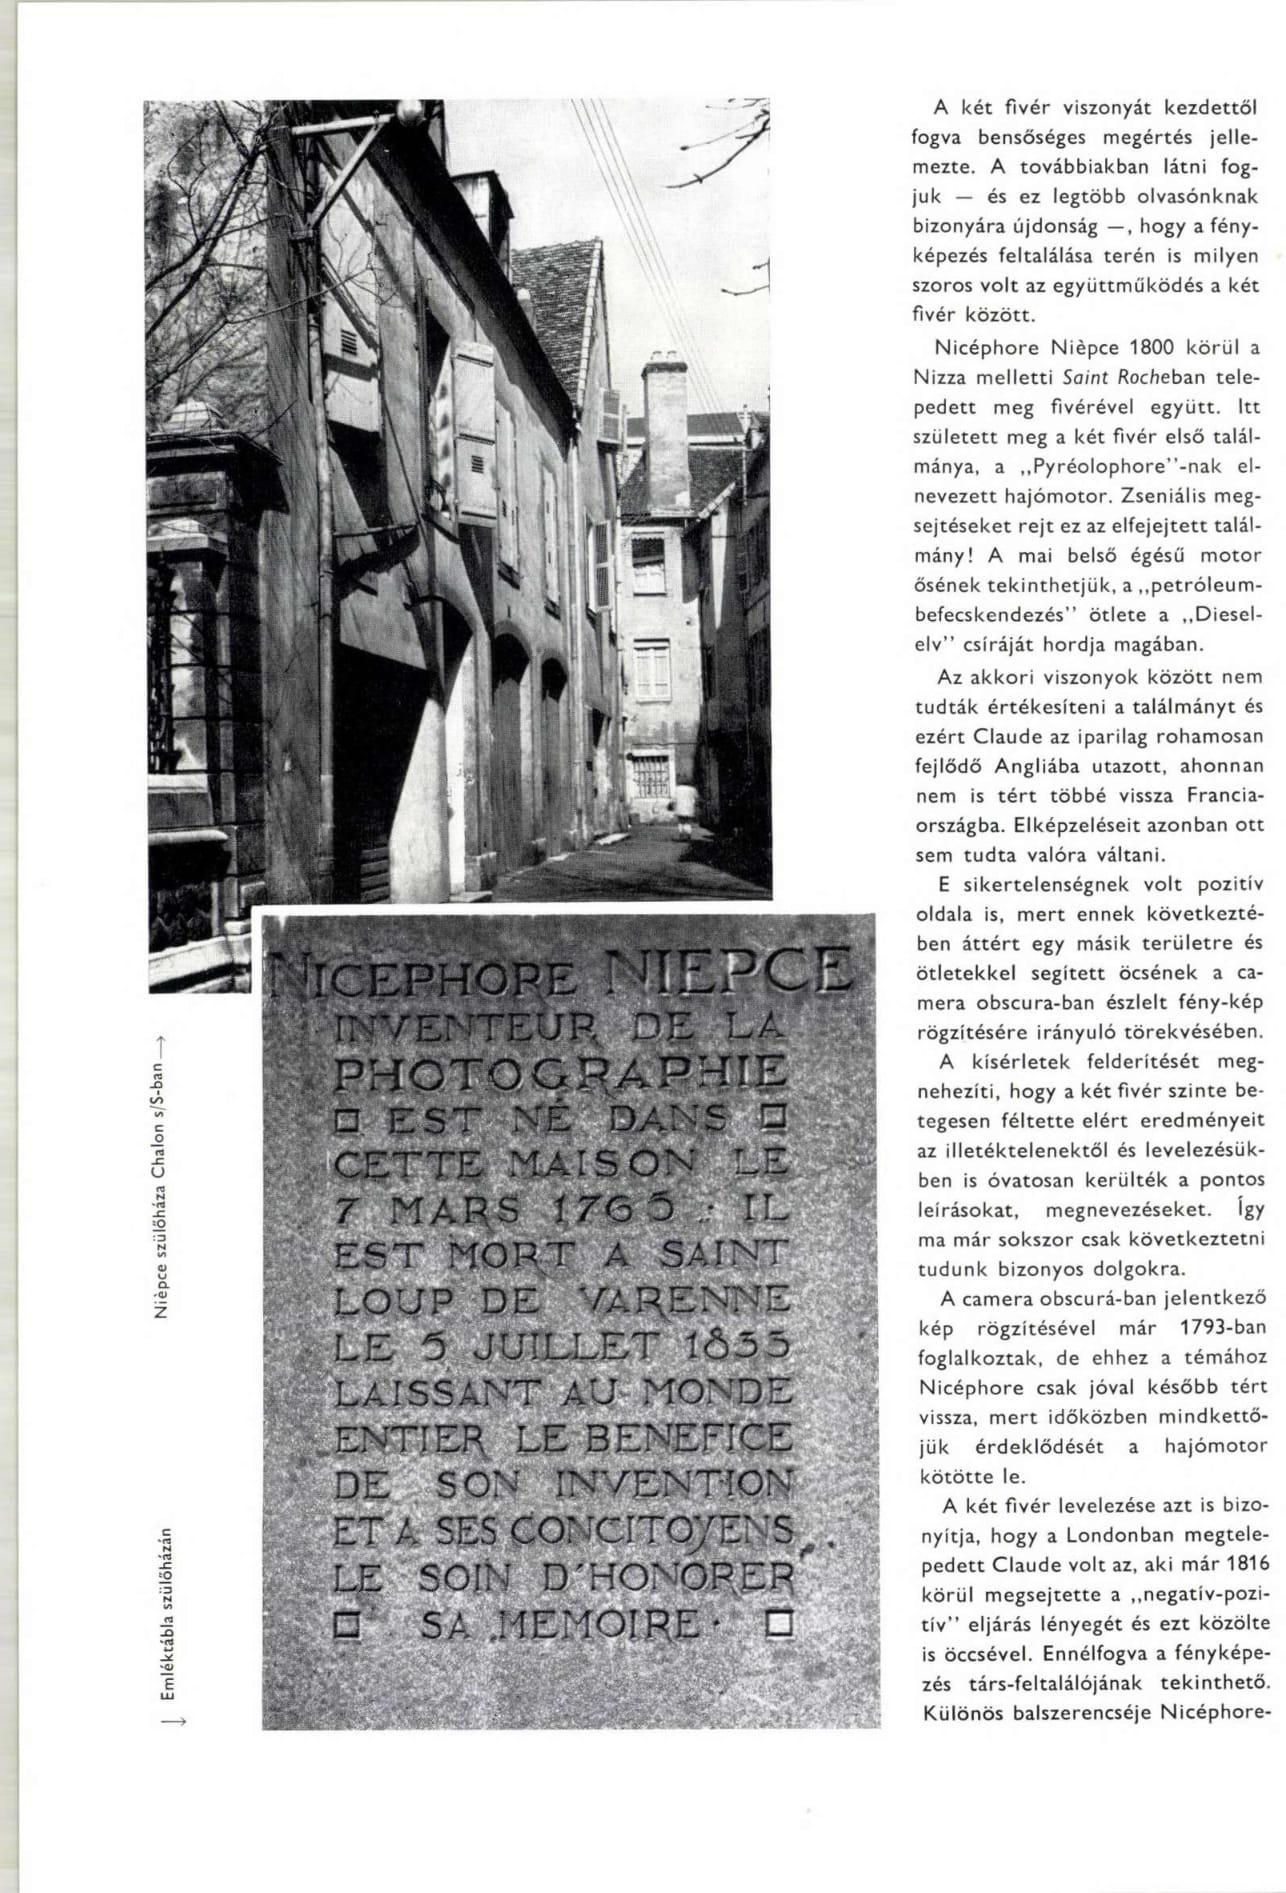 Foto, XIII. évfolyam, 1966. július<br />290. o.<br /><br />forrás: arcanum.hu